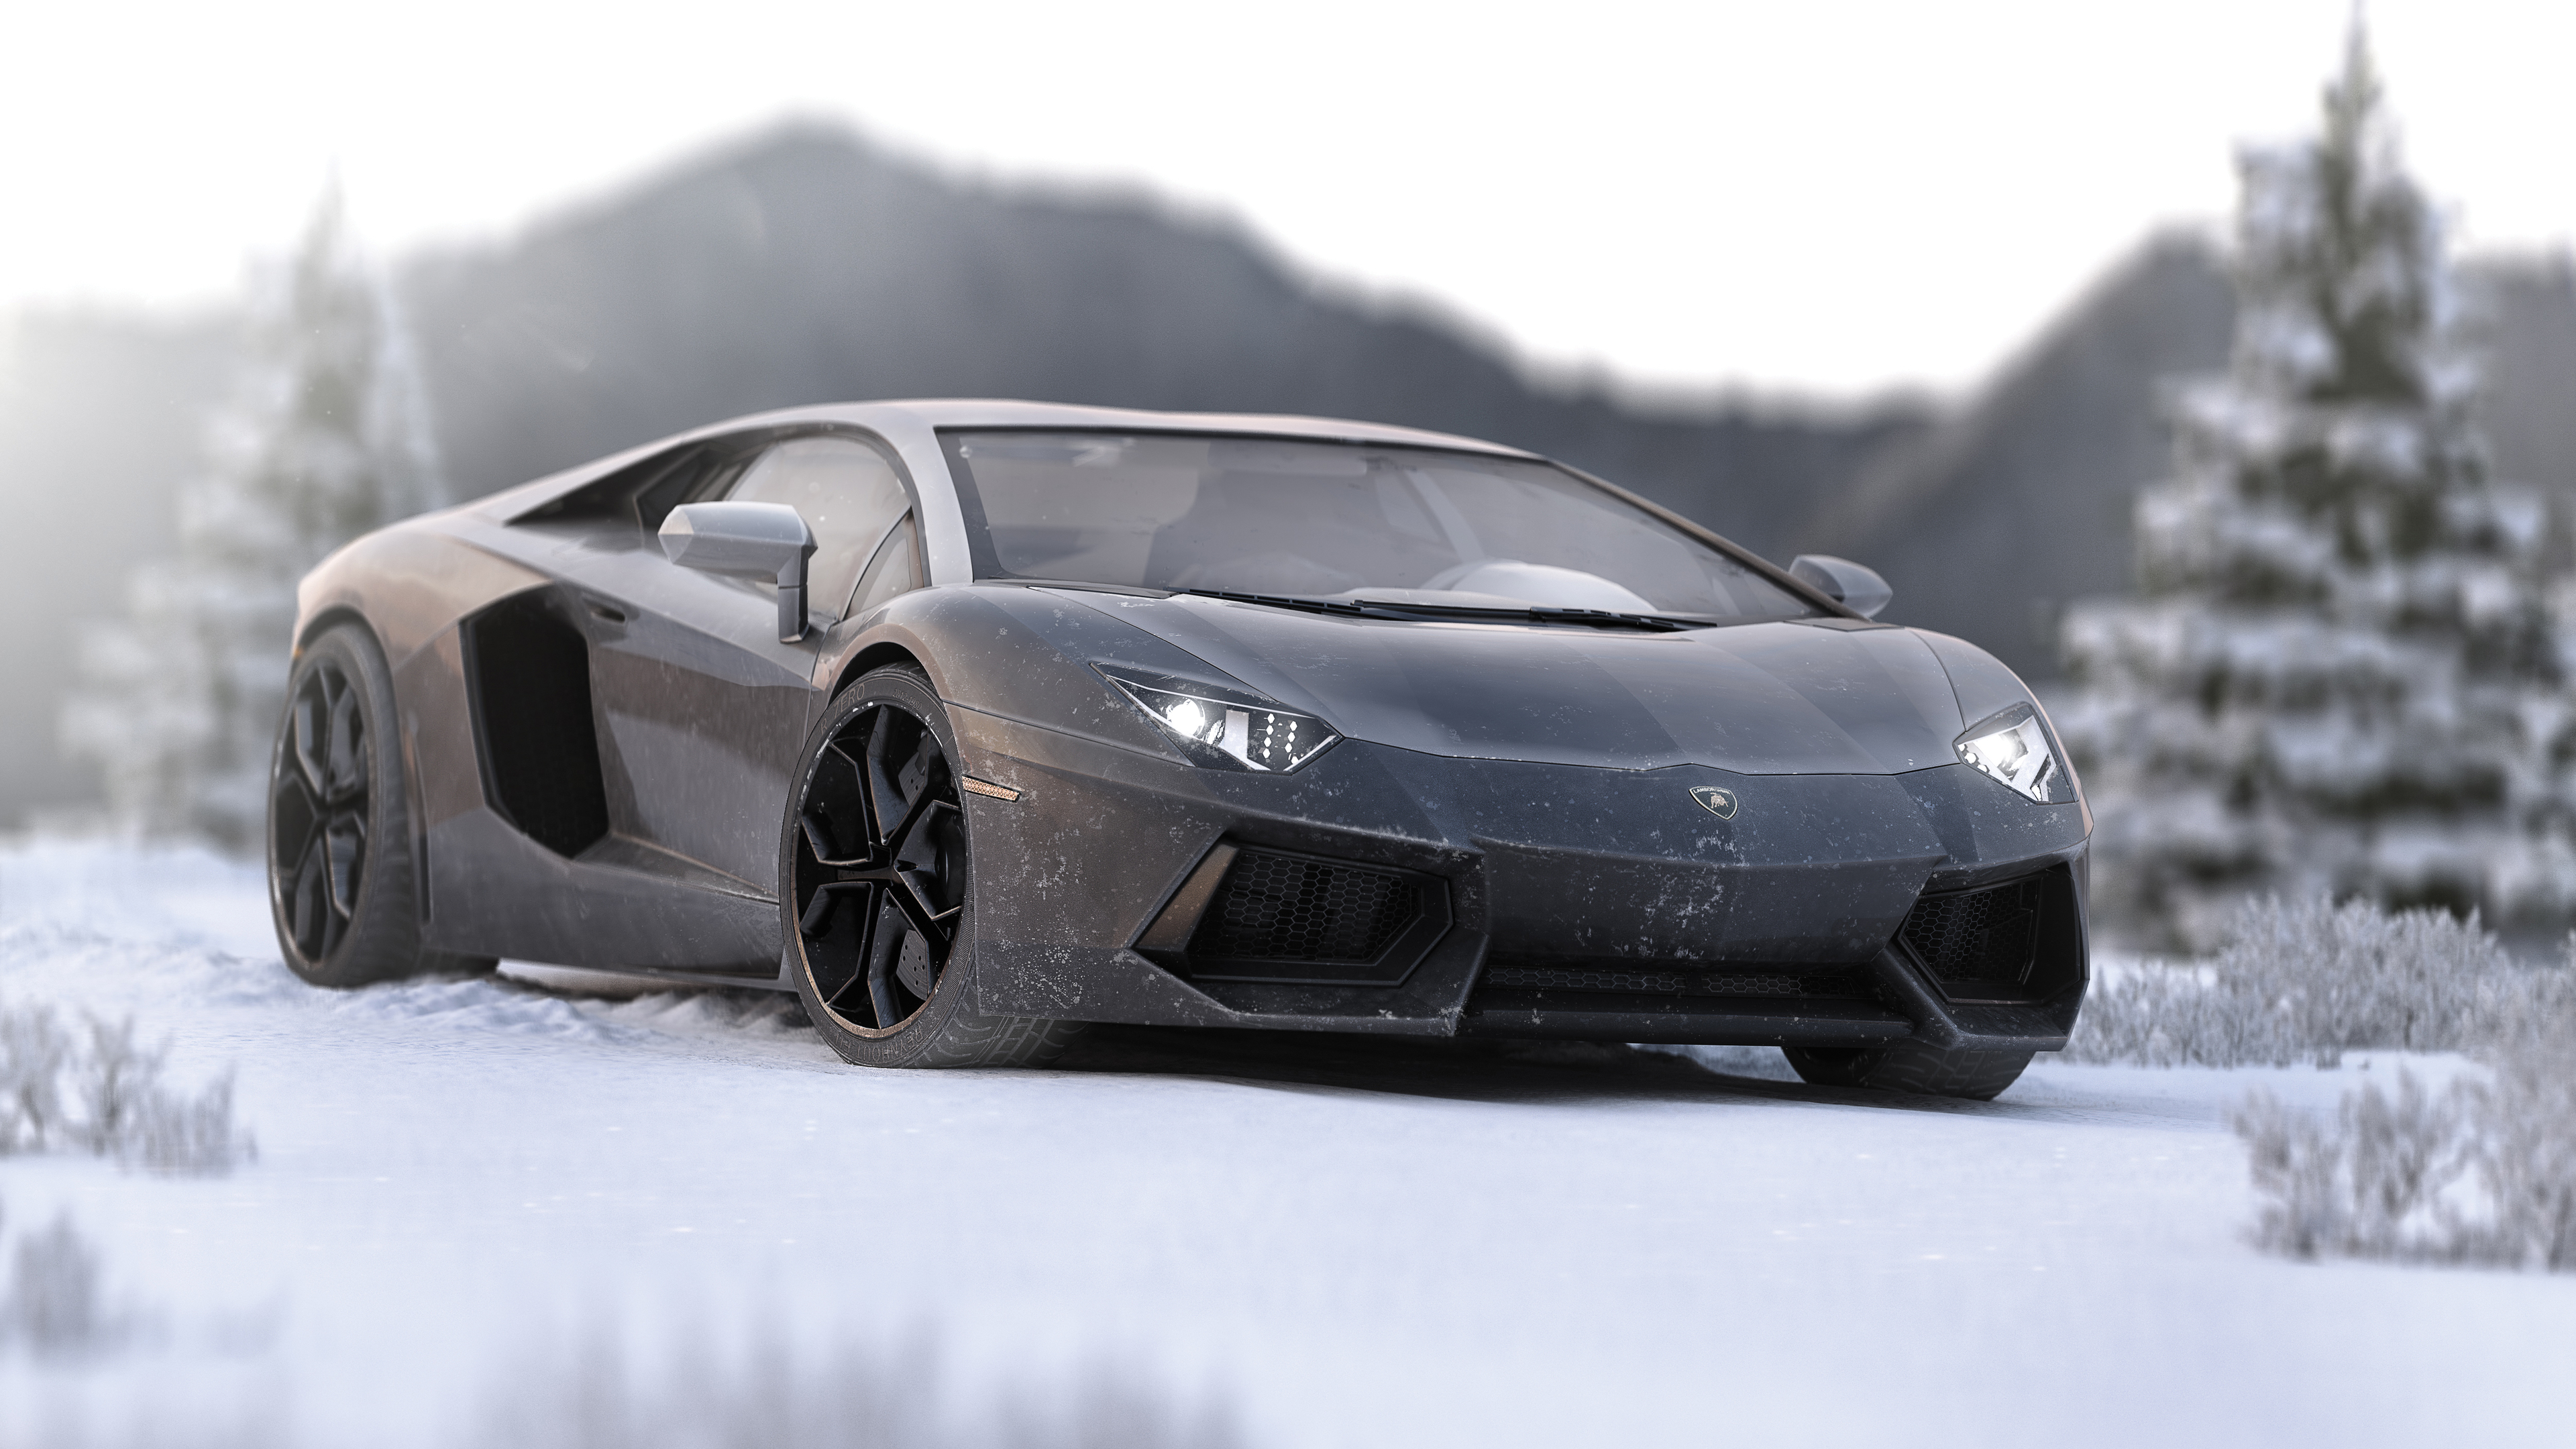 lamborghini aventador in ice 5k 1539792952 - Lamborghini Aventador In Ice 5k - lamborghini wallpapers, lamborghini aventador wallpapers, hd-wallpapers, cars wallpapers, 5k wallpapers, 4k-wallpapers